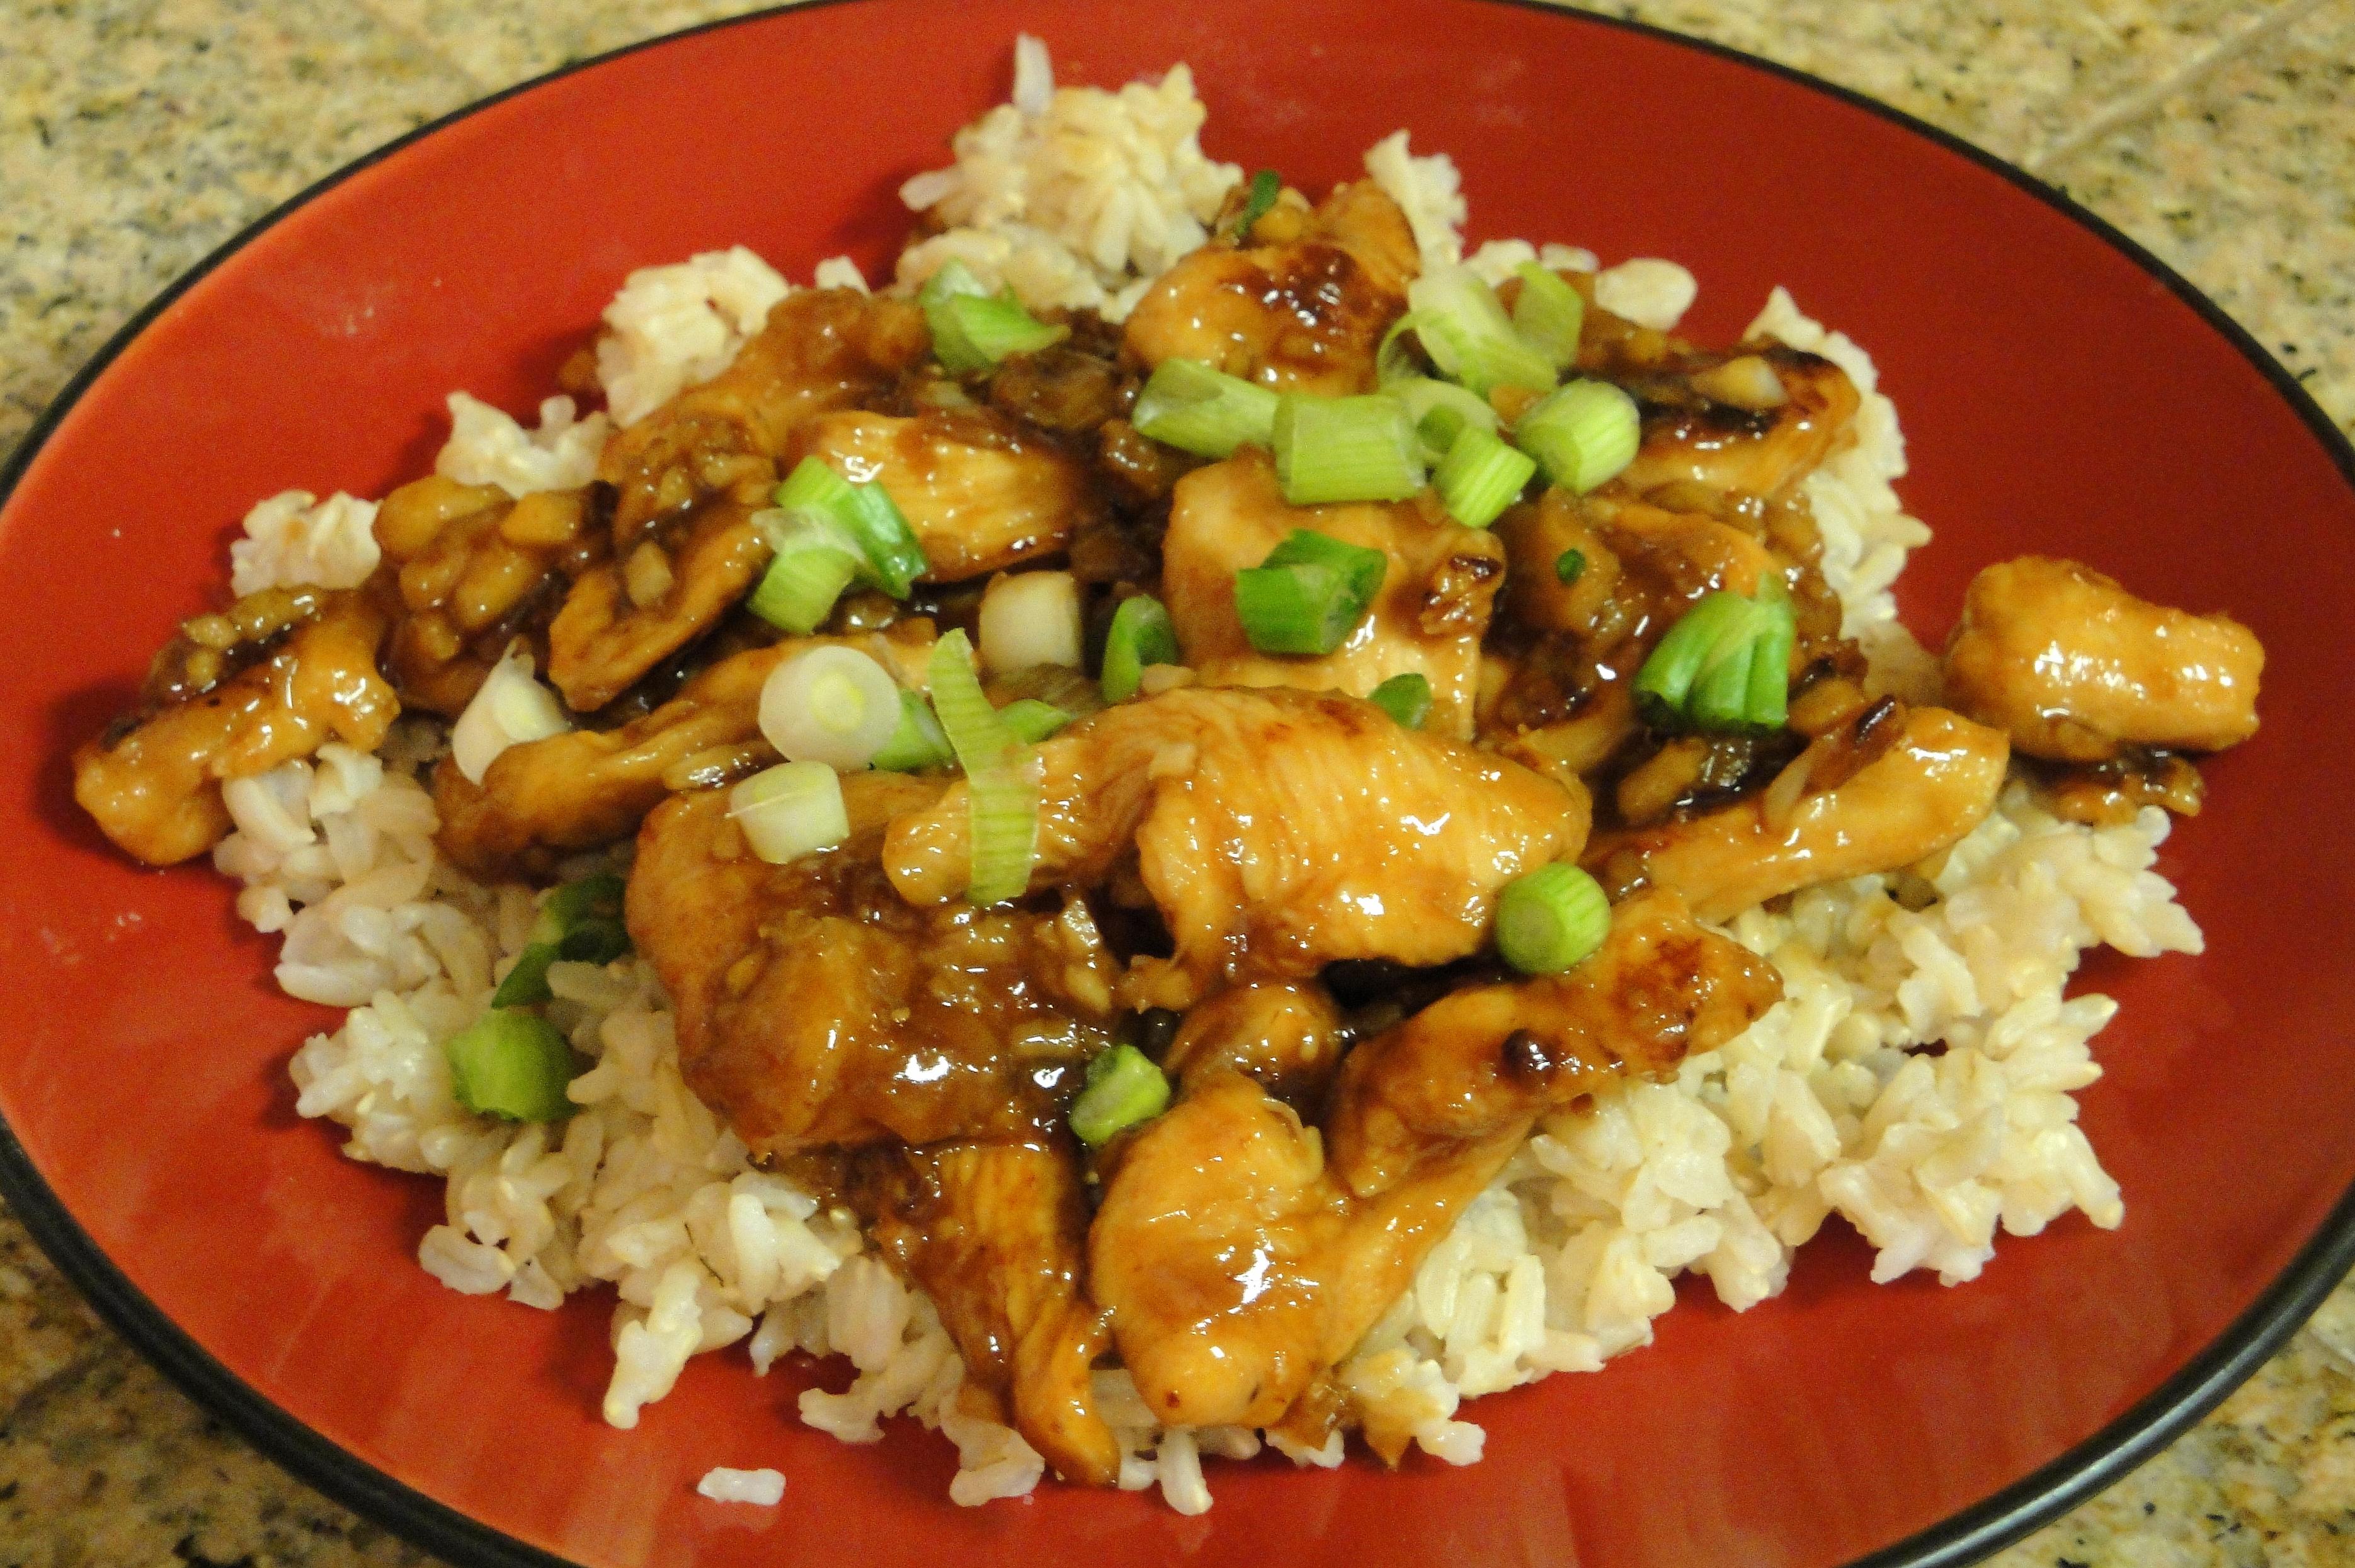 Kylling med ingefær (Gai Pad Khing)